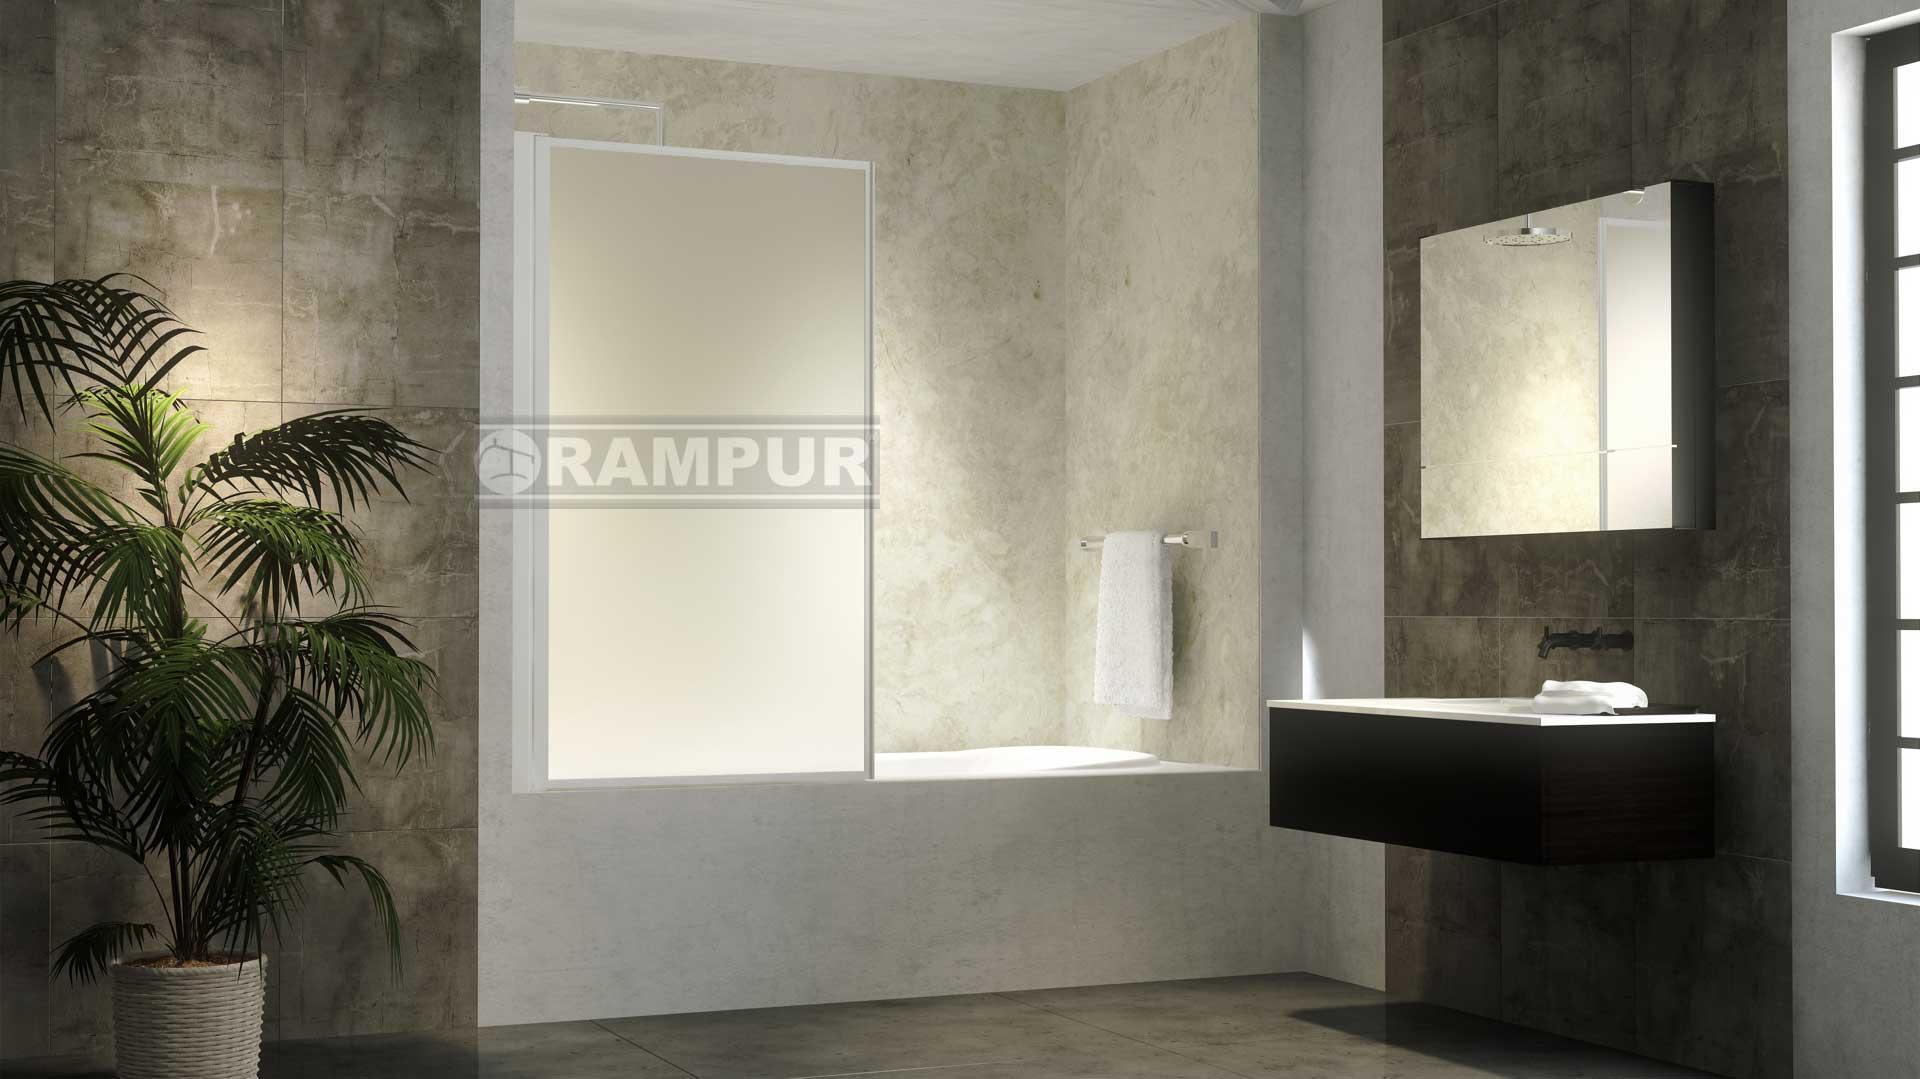 Rampur mamparas rebatibles de acrilico andes premium for Modelos de baneras para bano